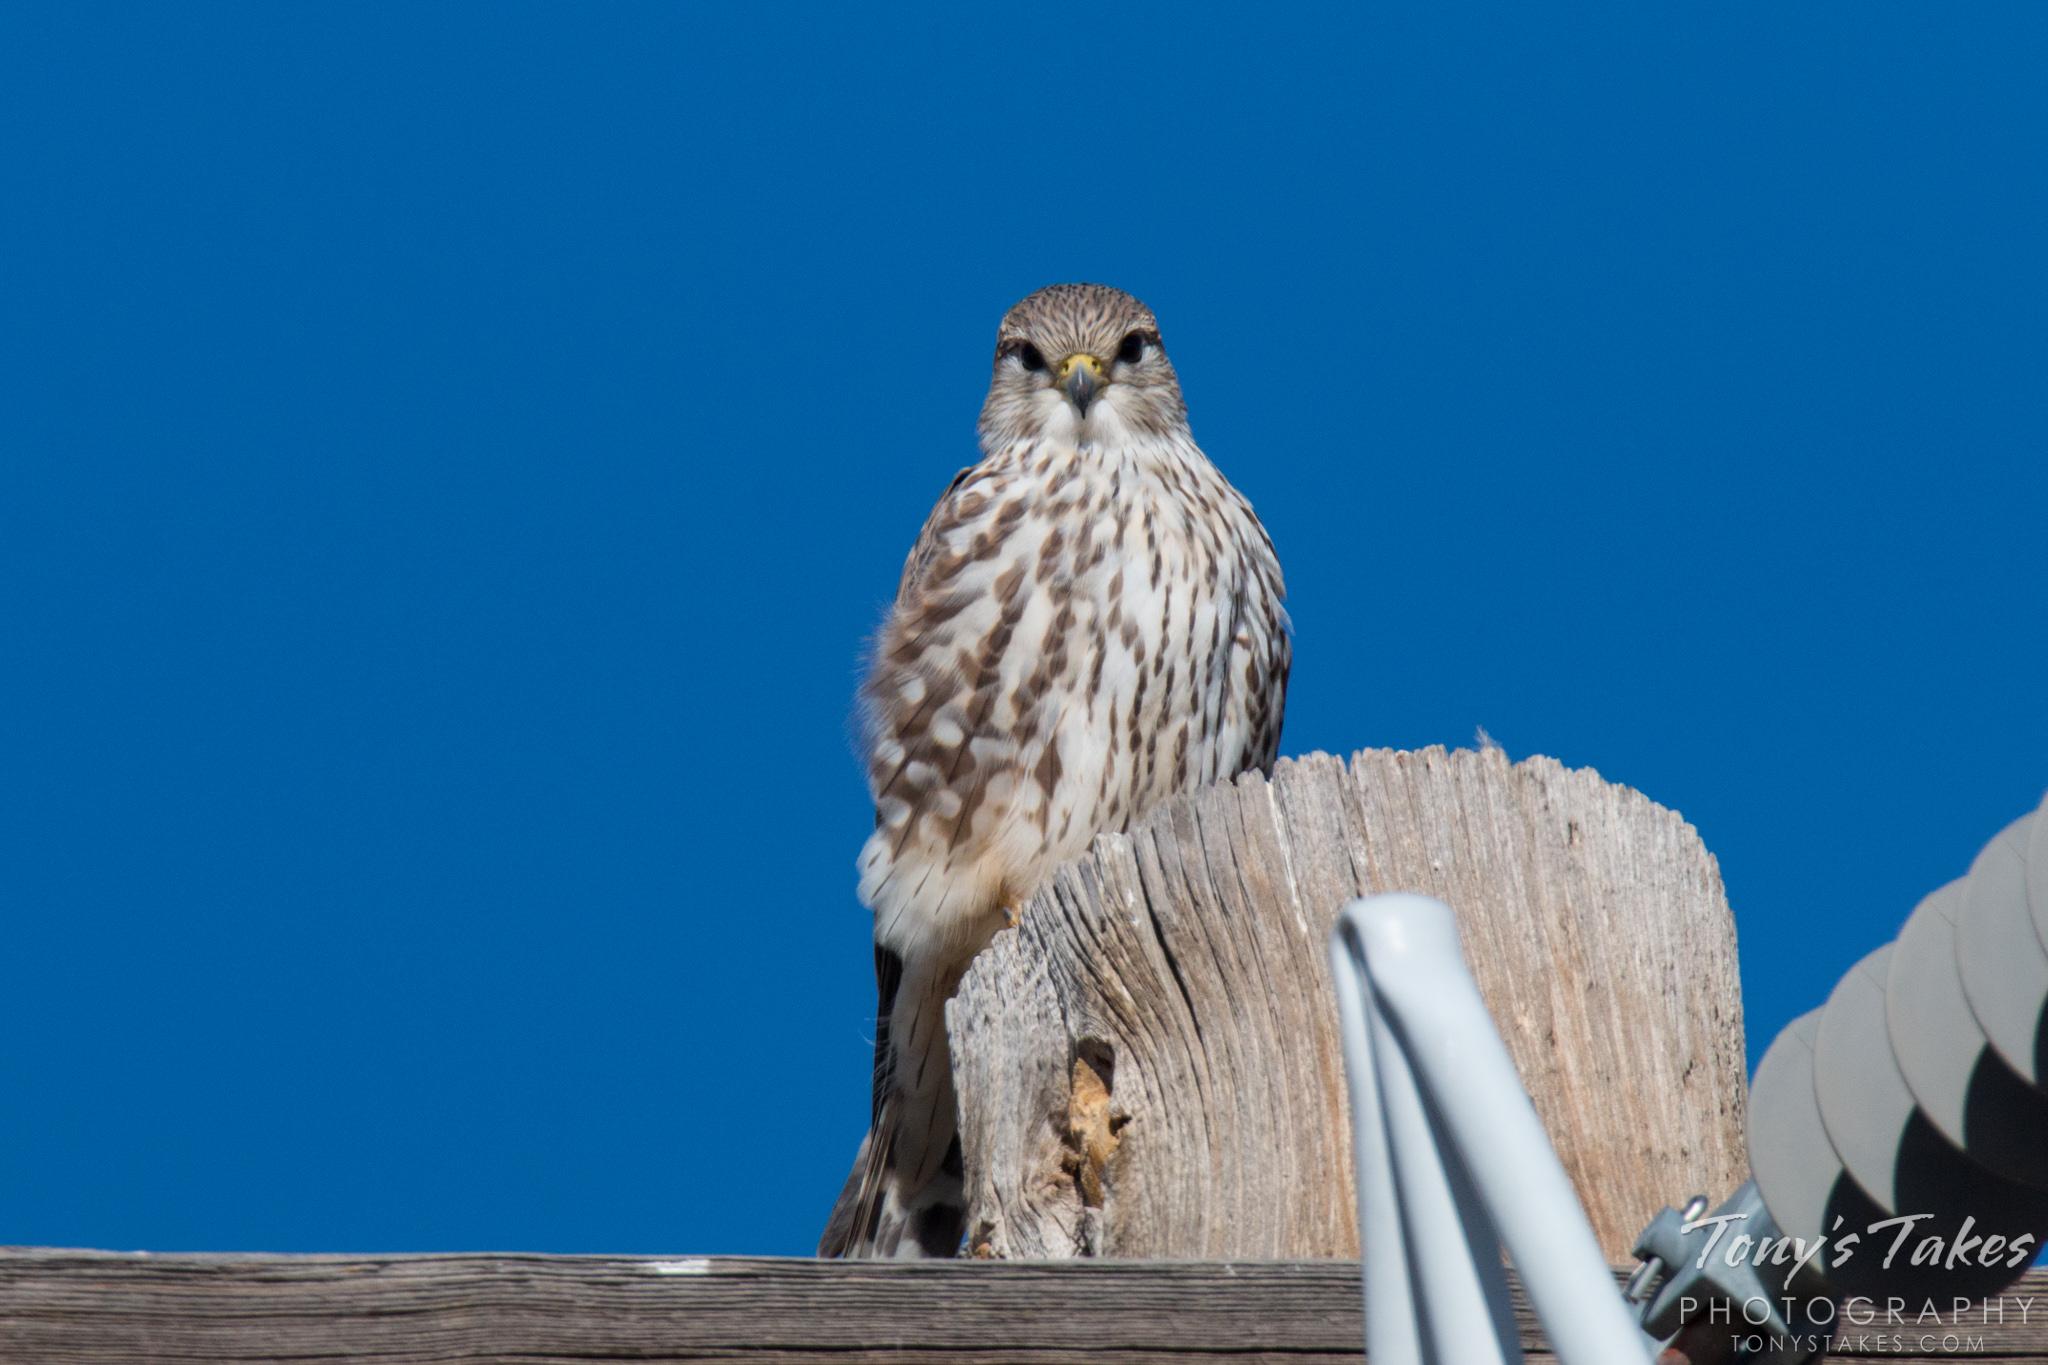 Fantastic little falcon